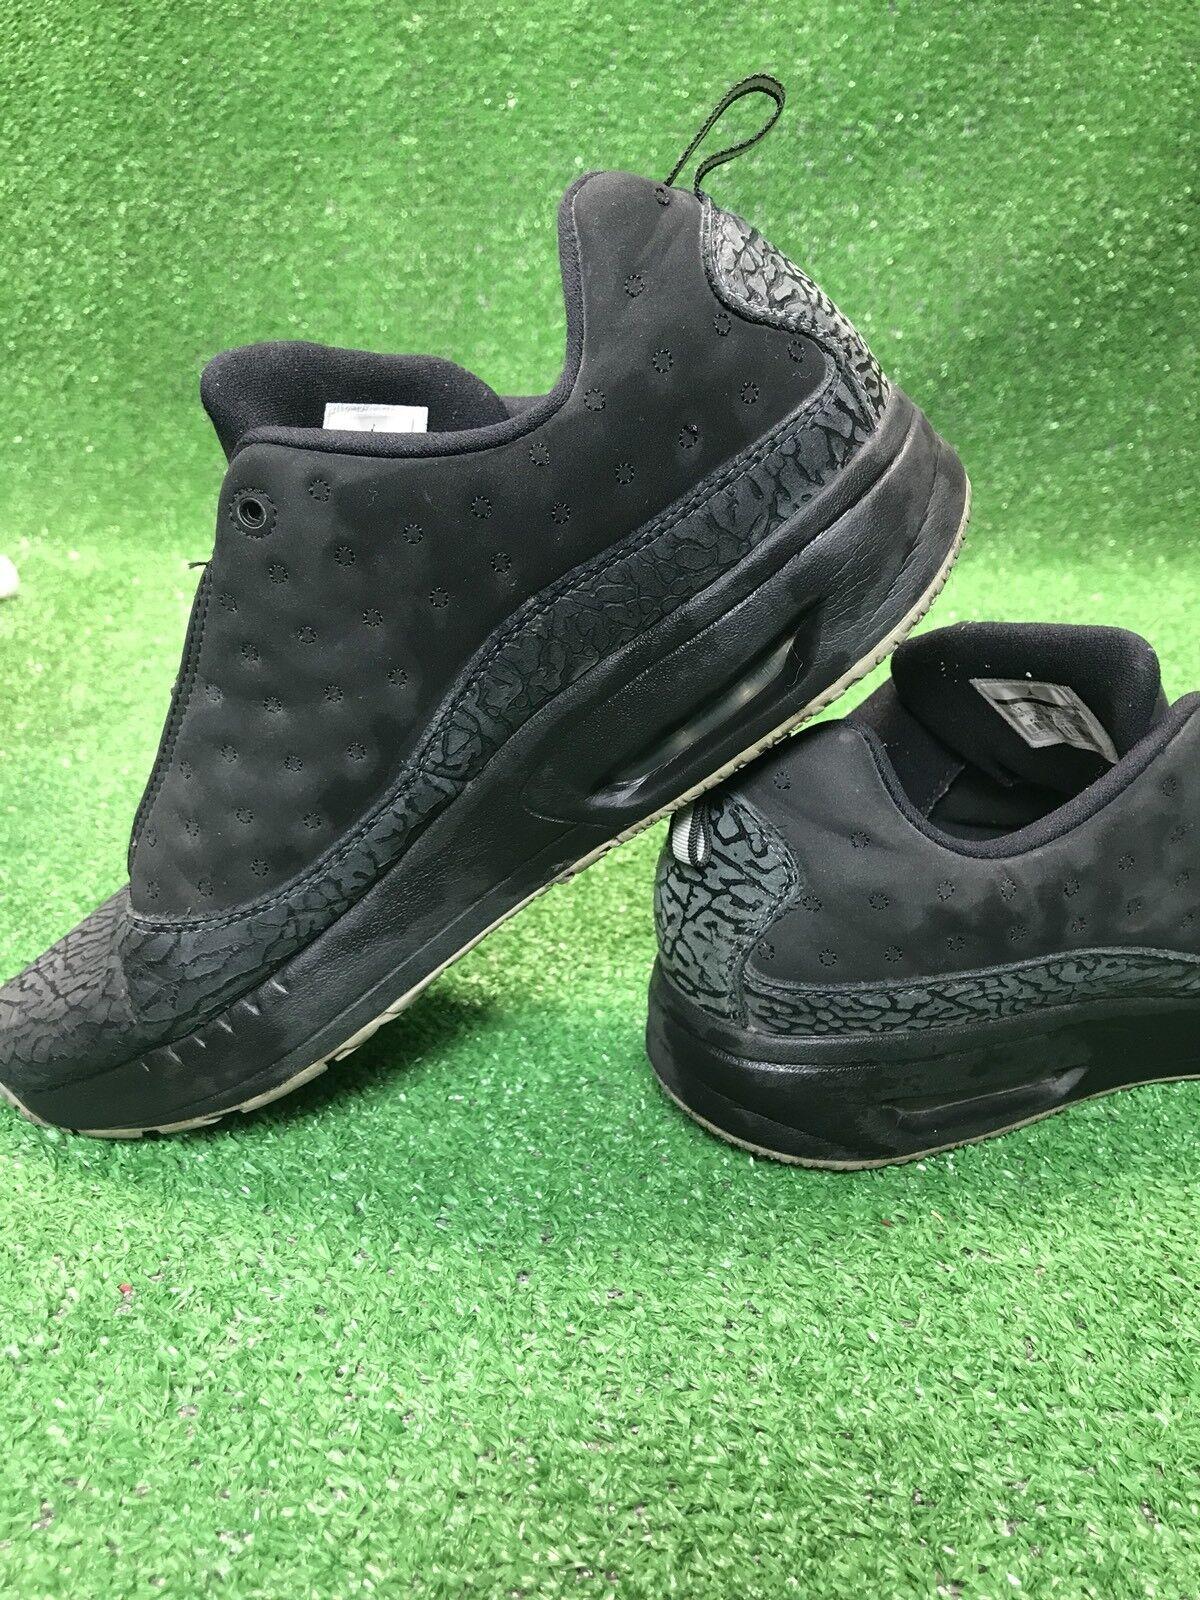 best website bc103 3f922 ... 2018 Nike Nike Nike Air Jordan XIII 13 cmft Viz Air confort negro  Stealth gris cemento ...